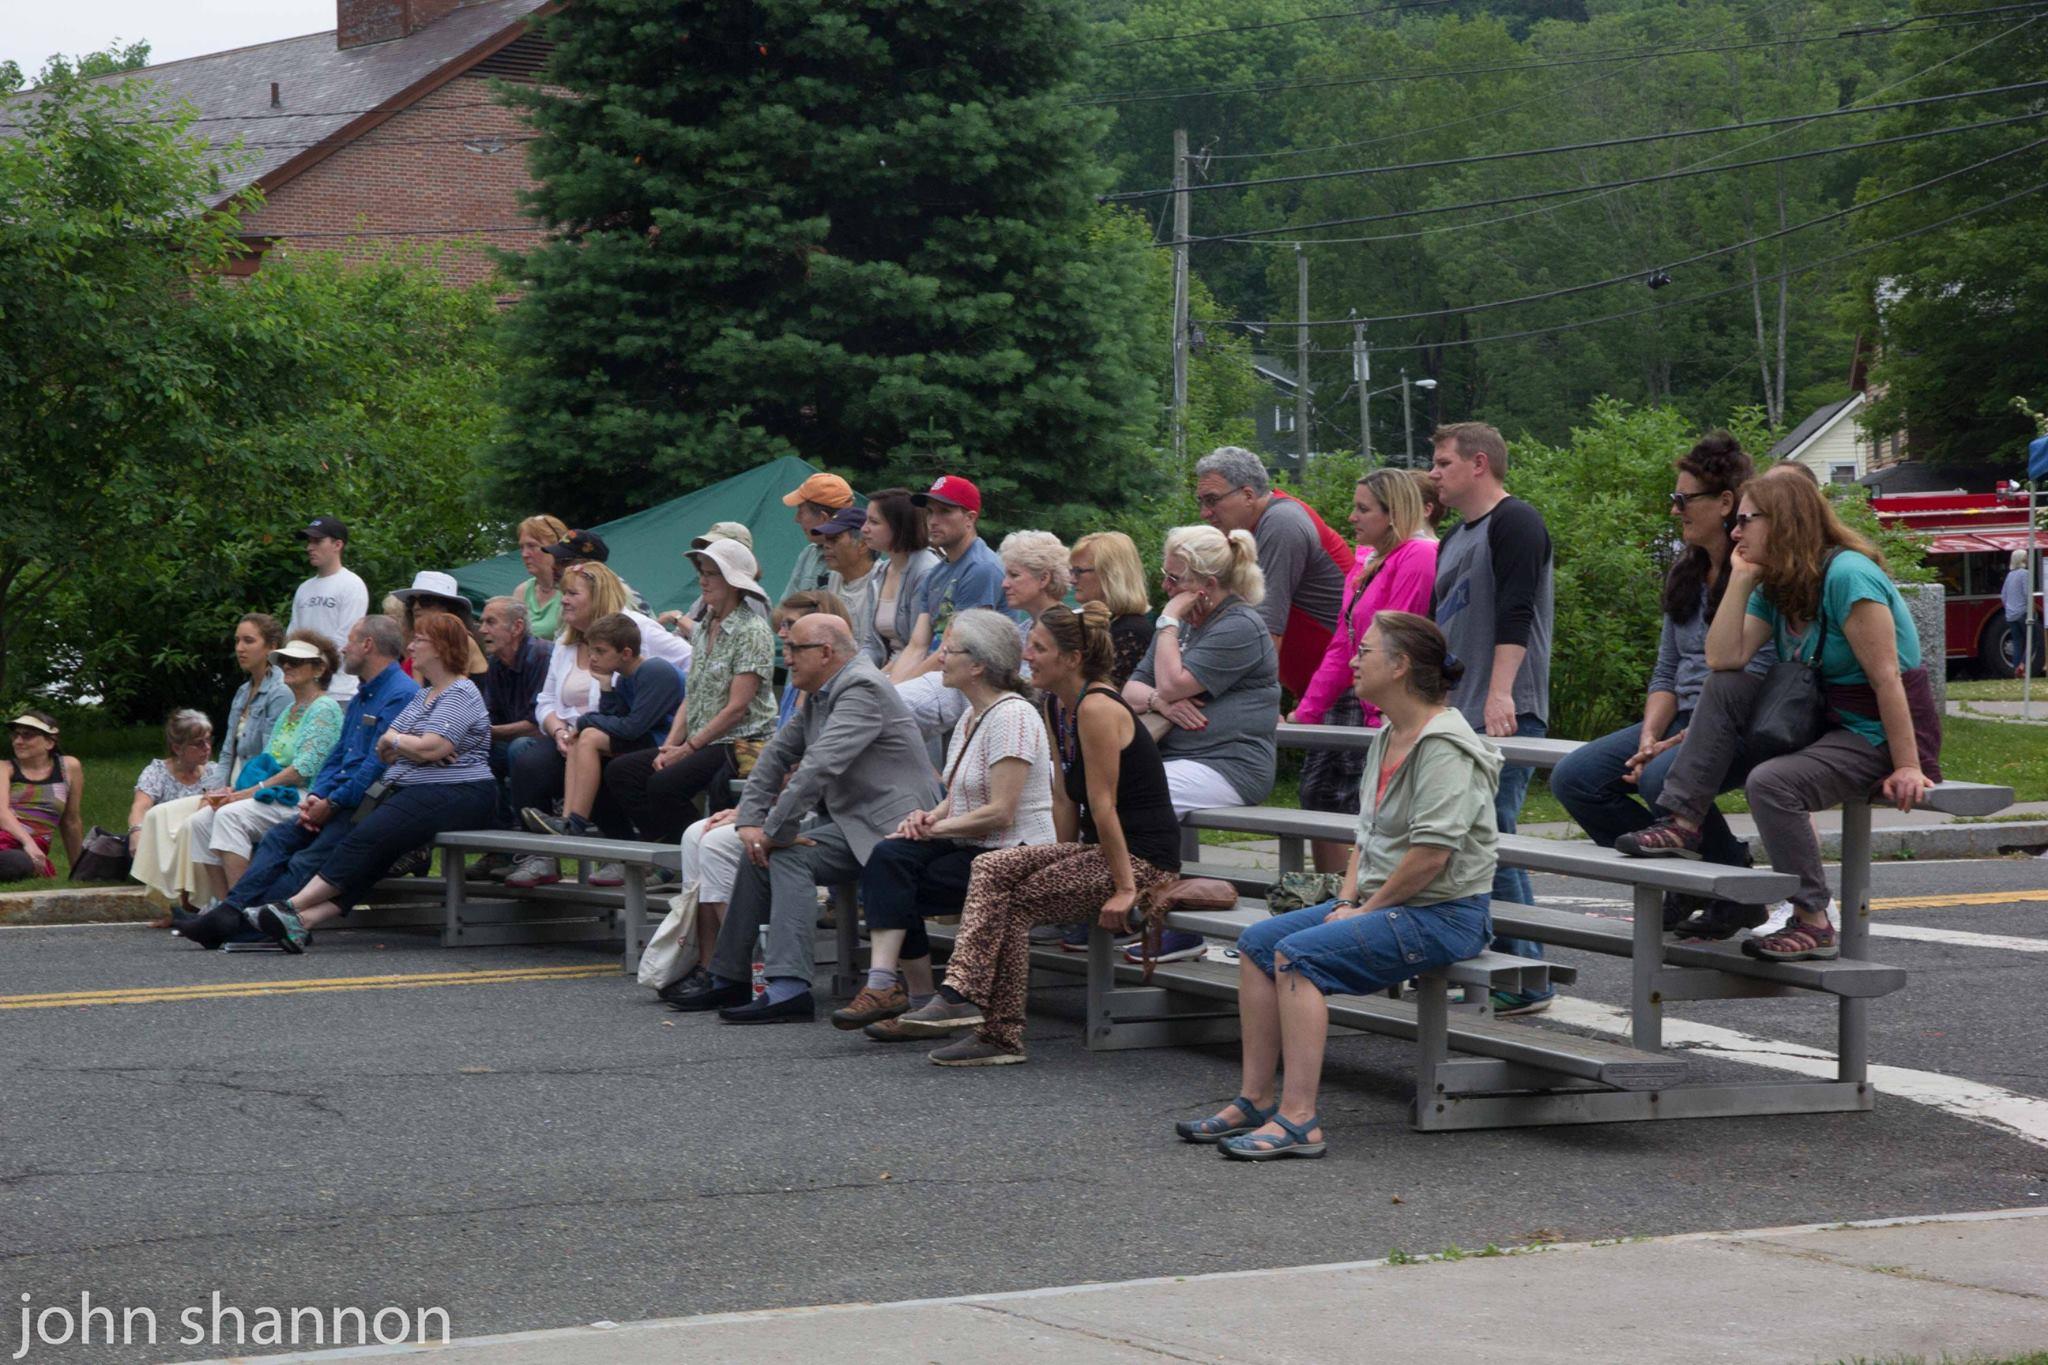 Crowd watching demos